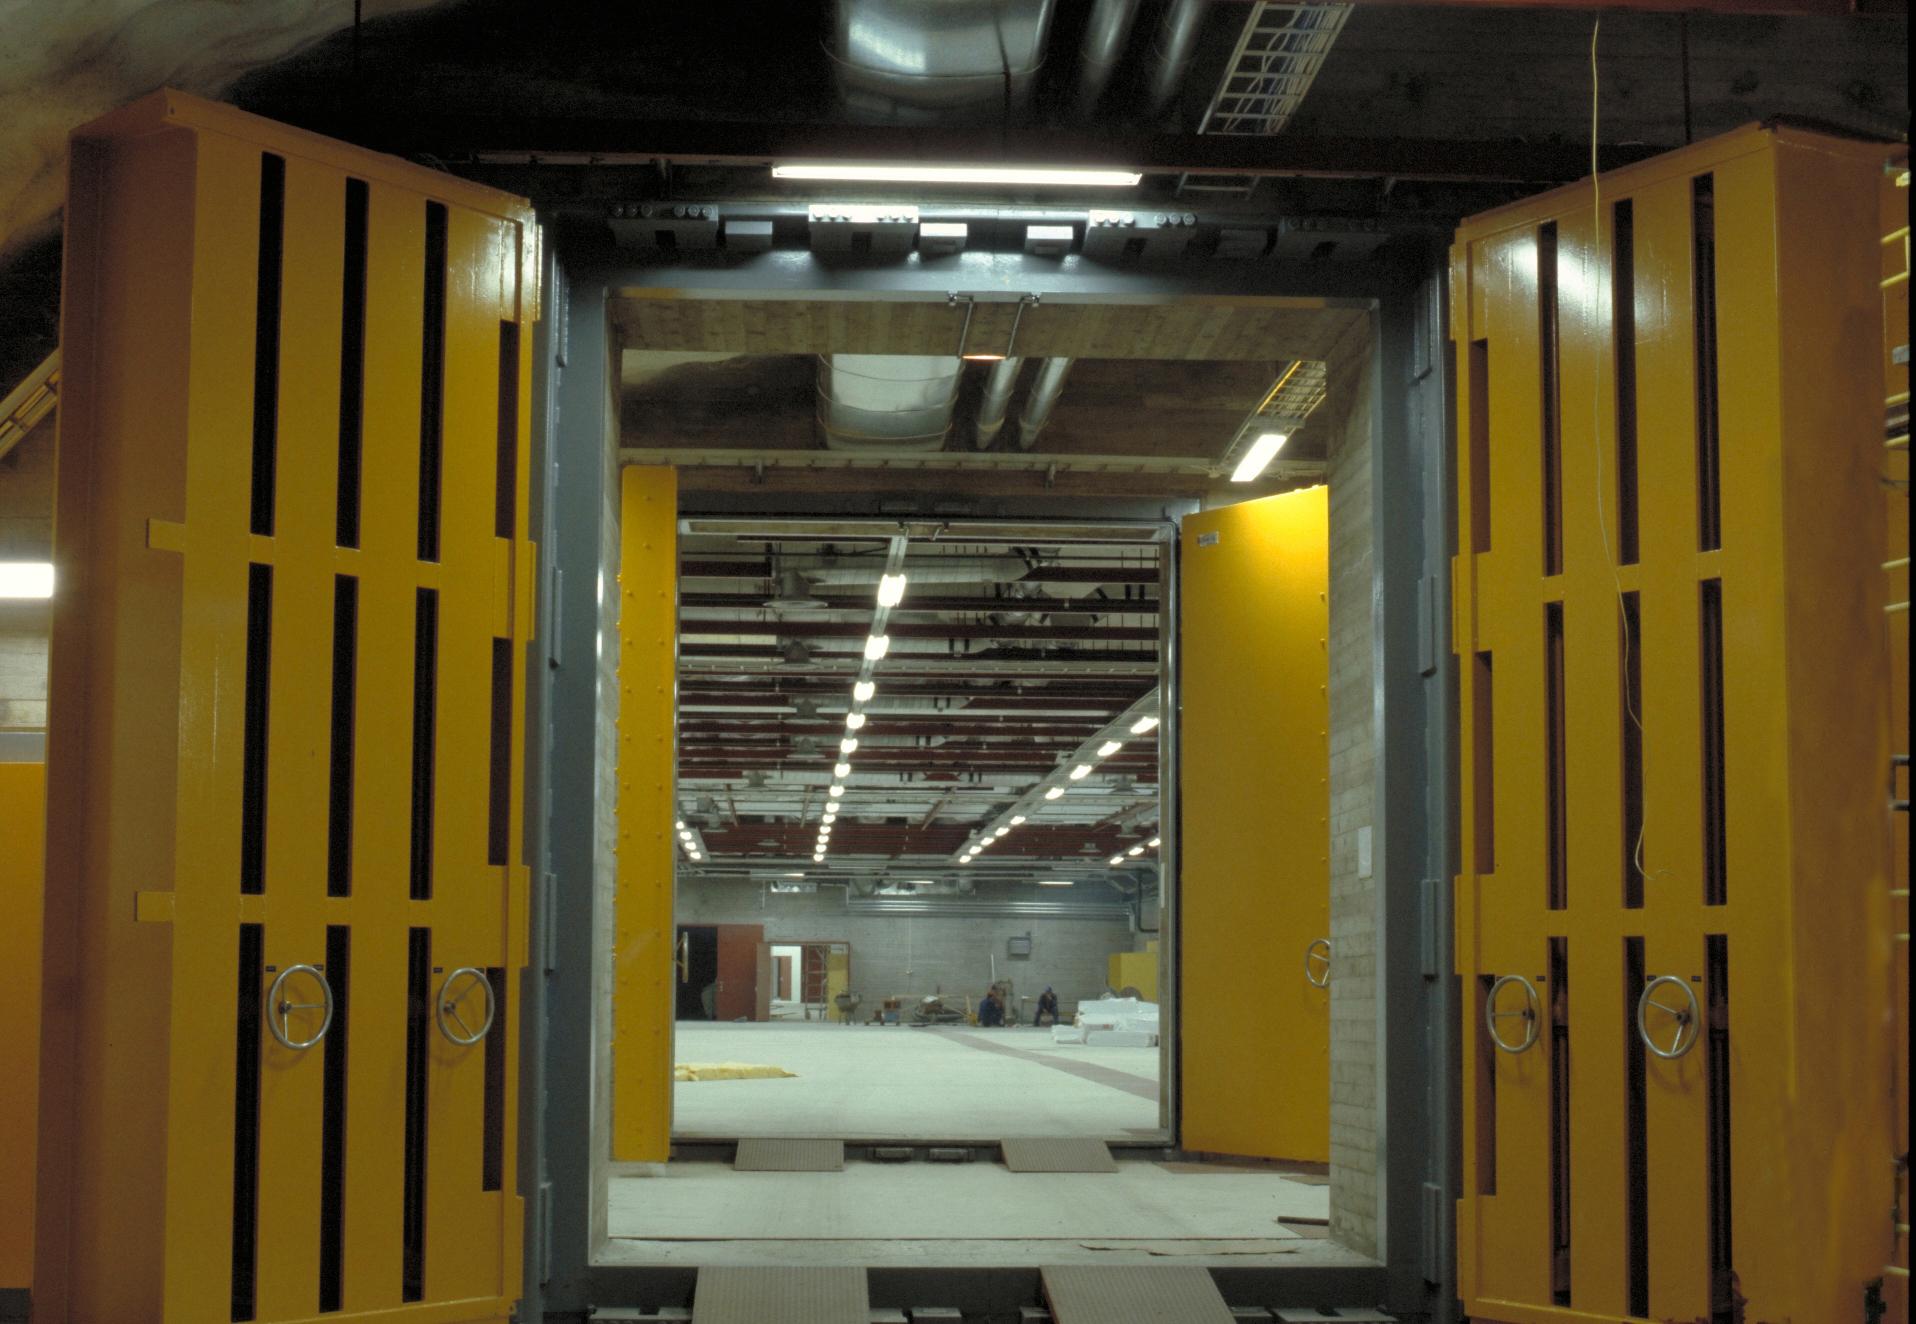 FileTEMET Blast Doors Gastightjpg Wikimedia Commons